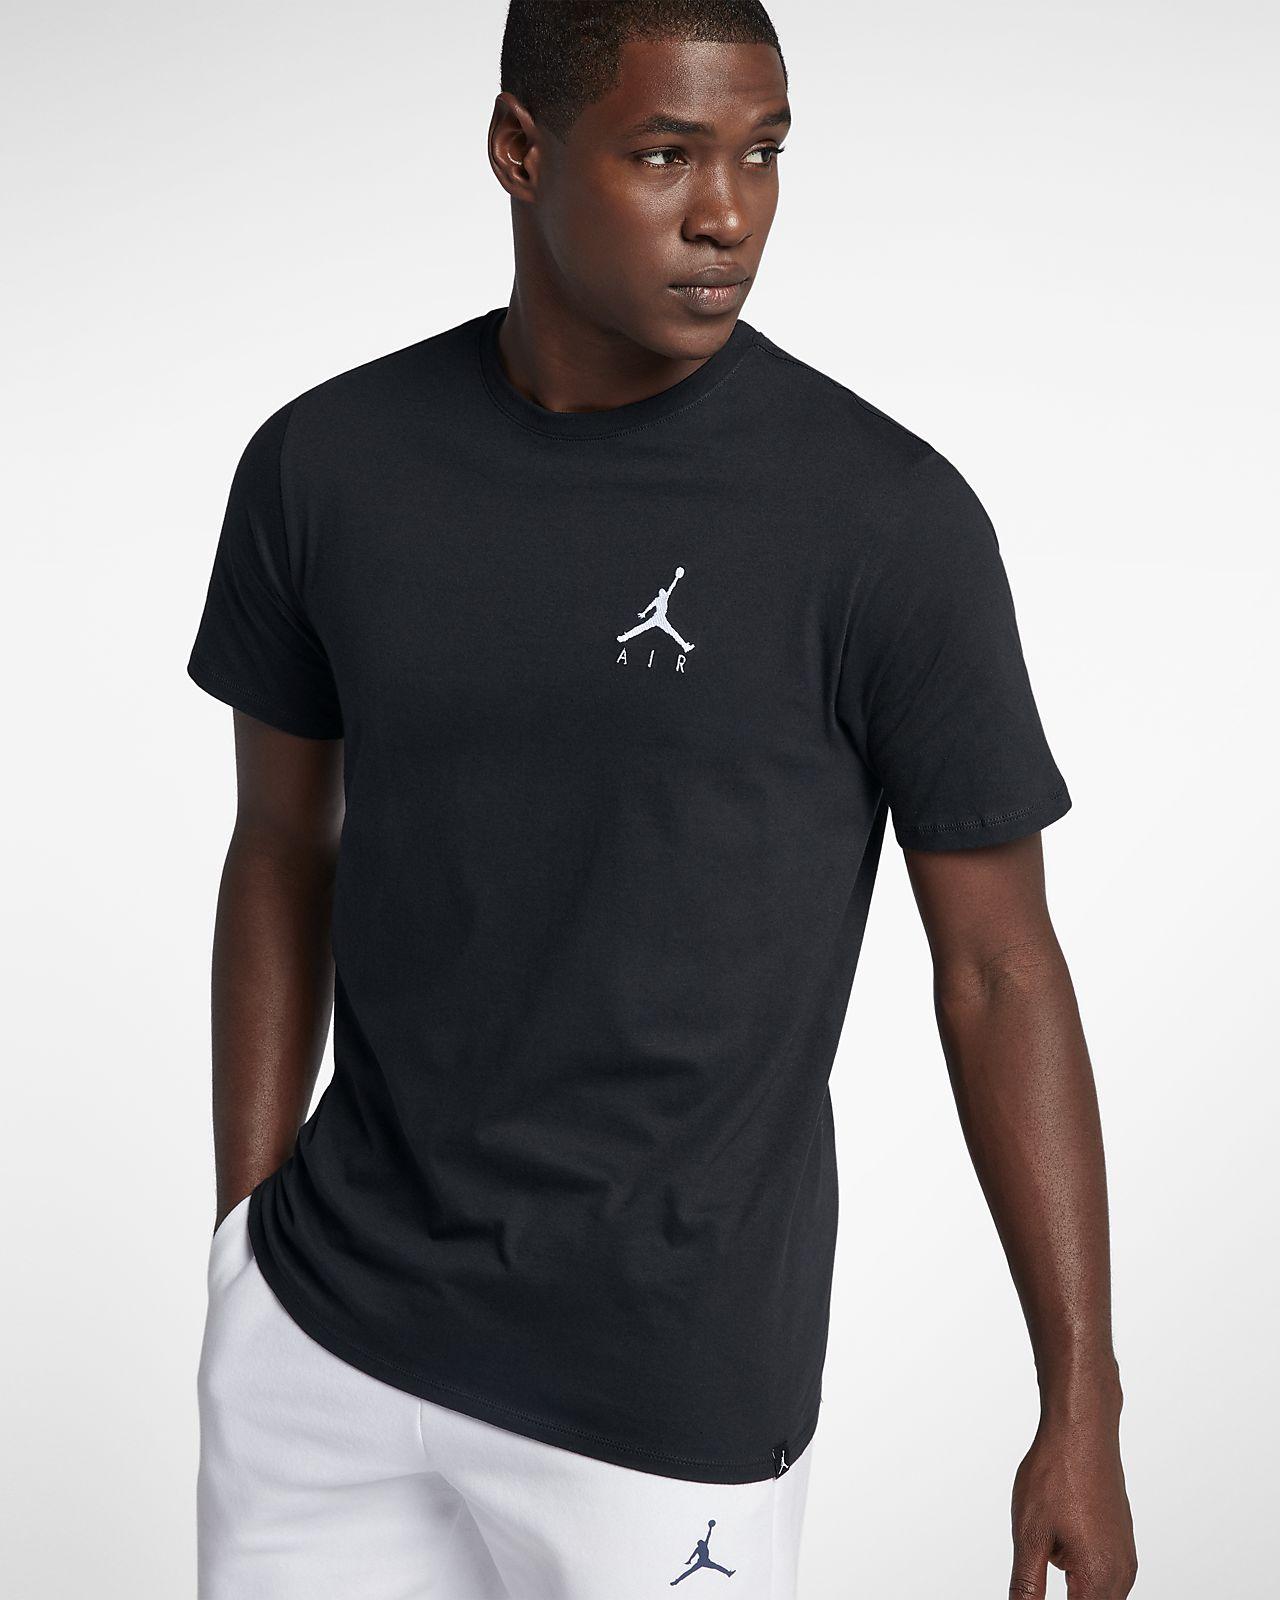 Jordan Jumpman Air Erkek Tişörtü